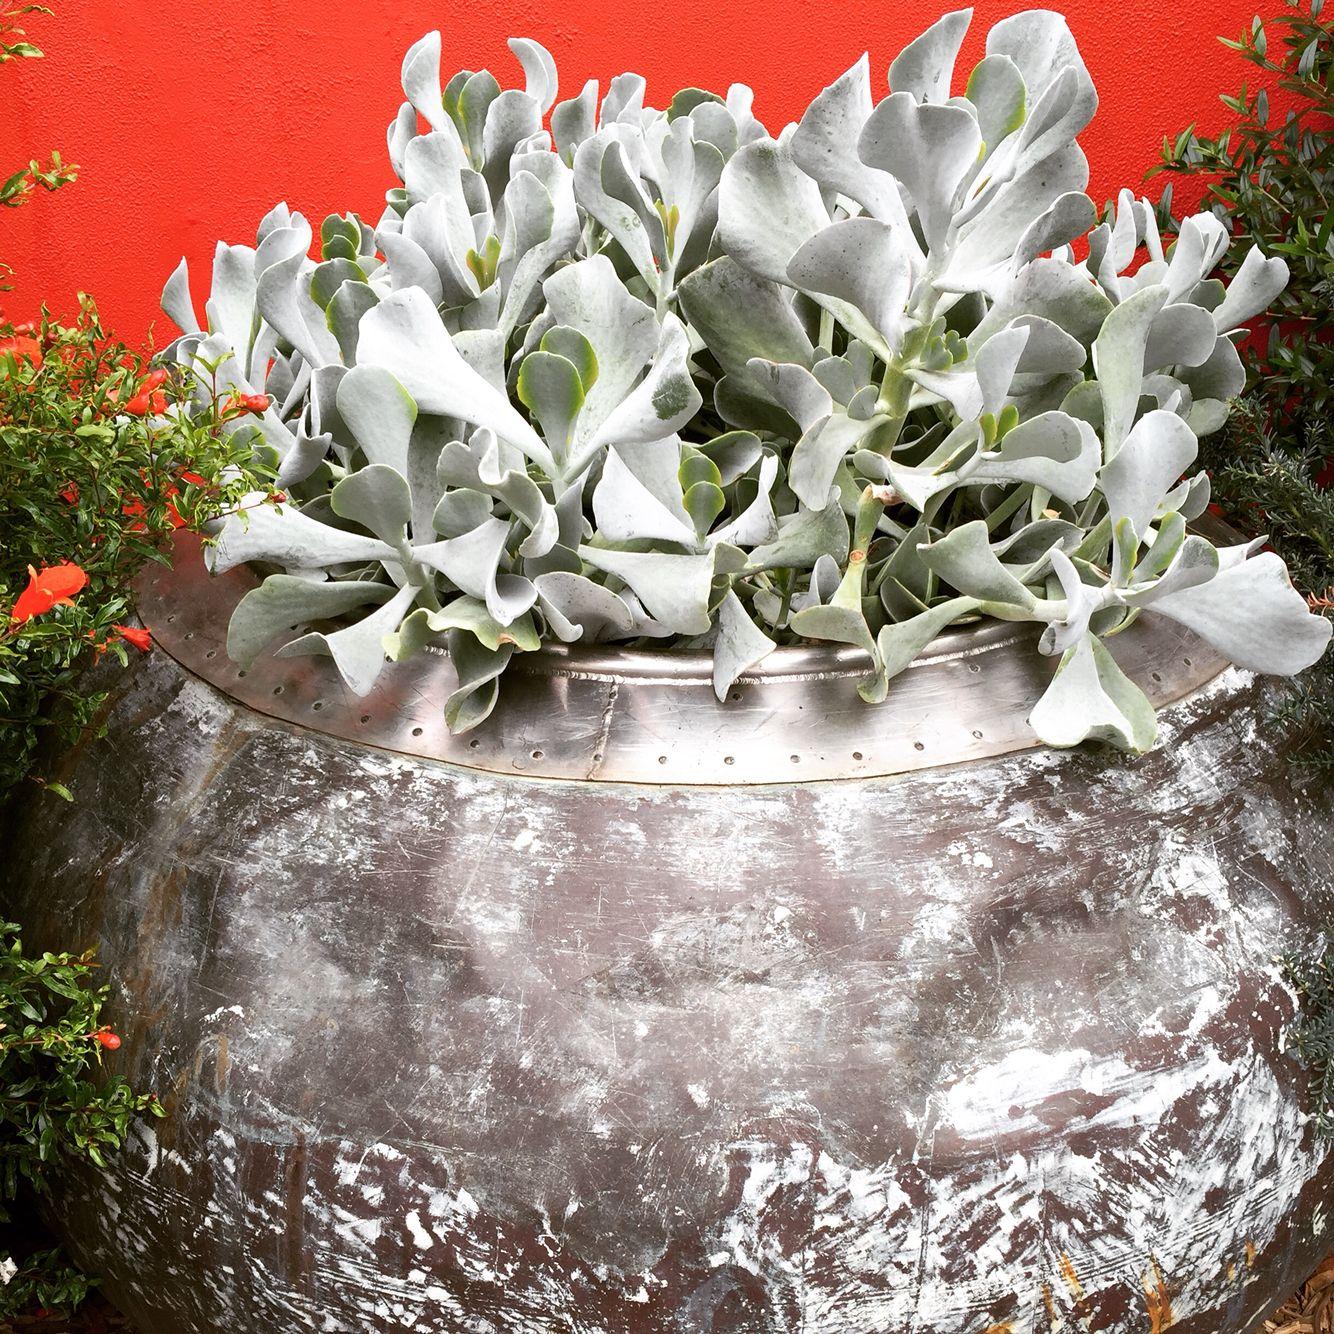 Cotyledon Orbiculata - Bulleen Art & Garden